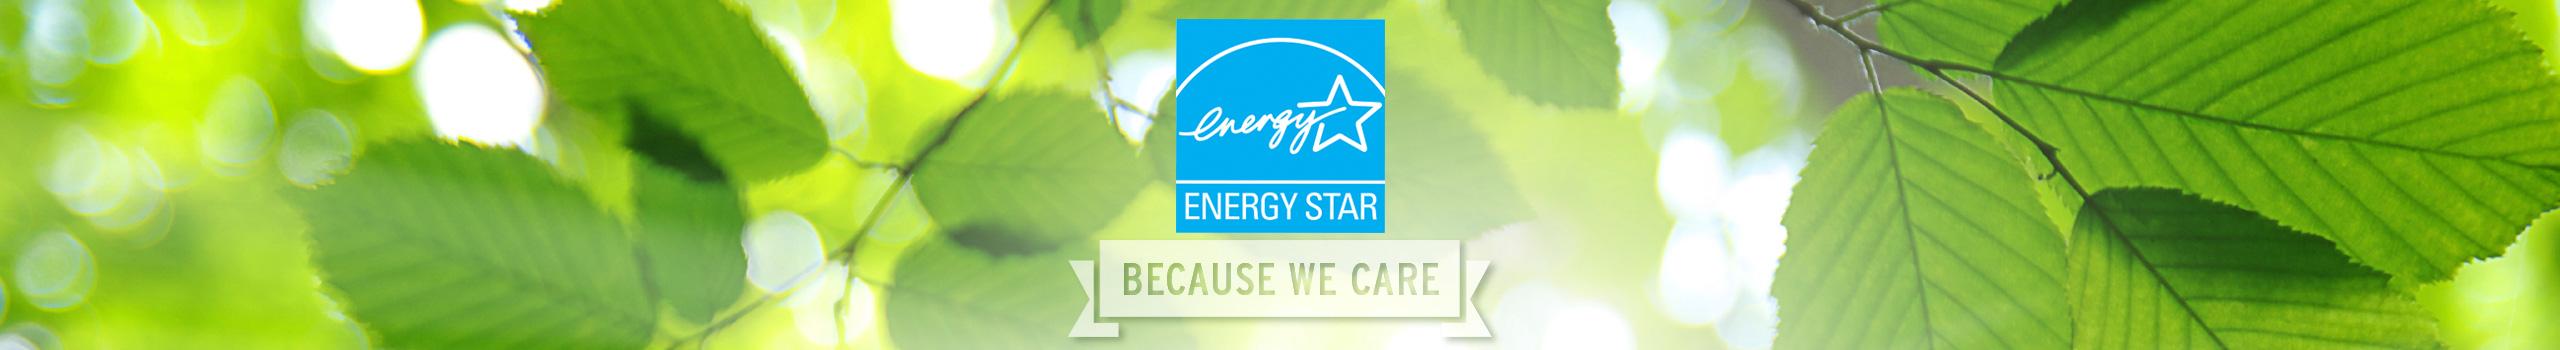 lang_energy-star_banner